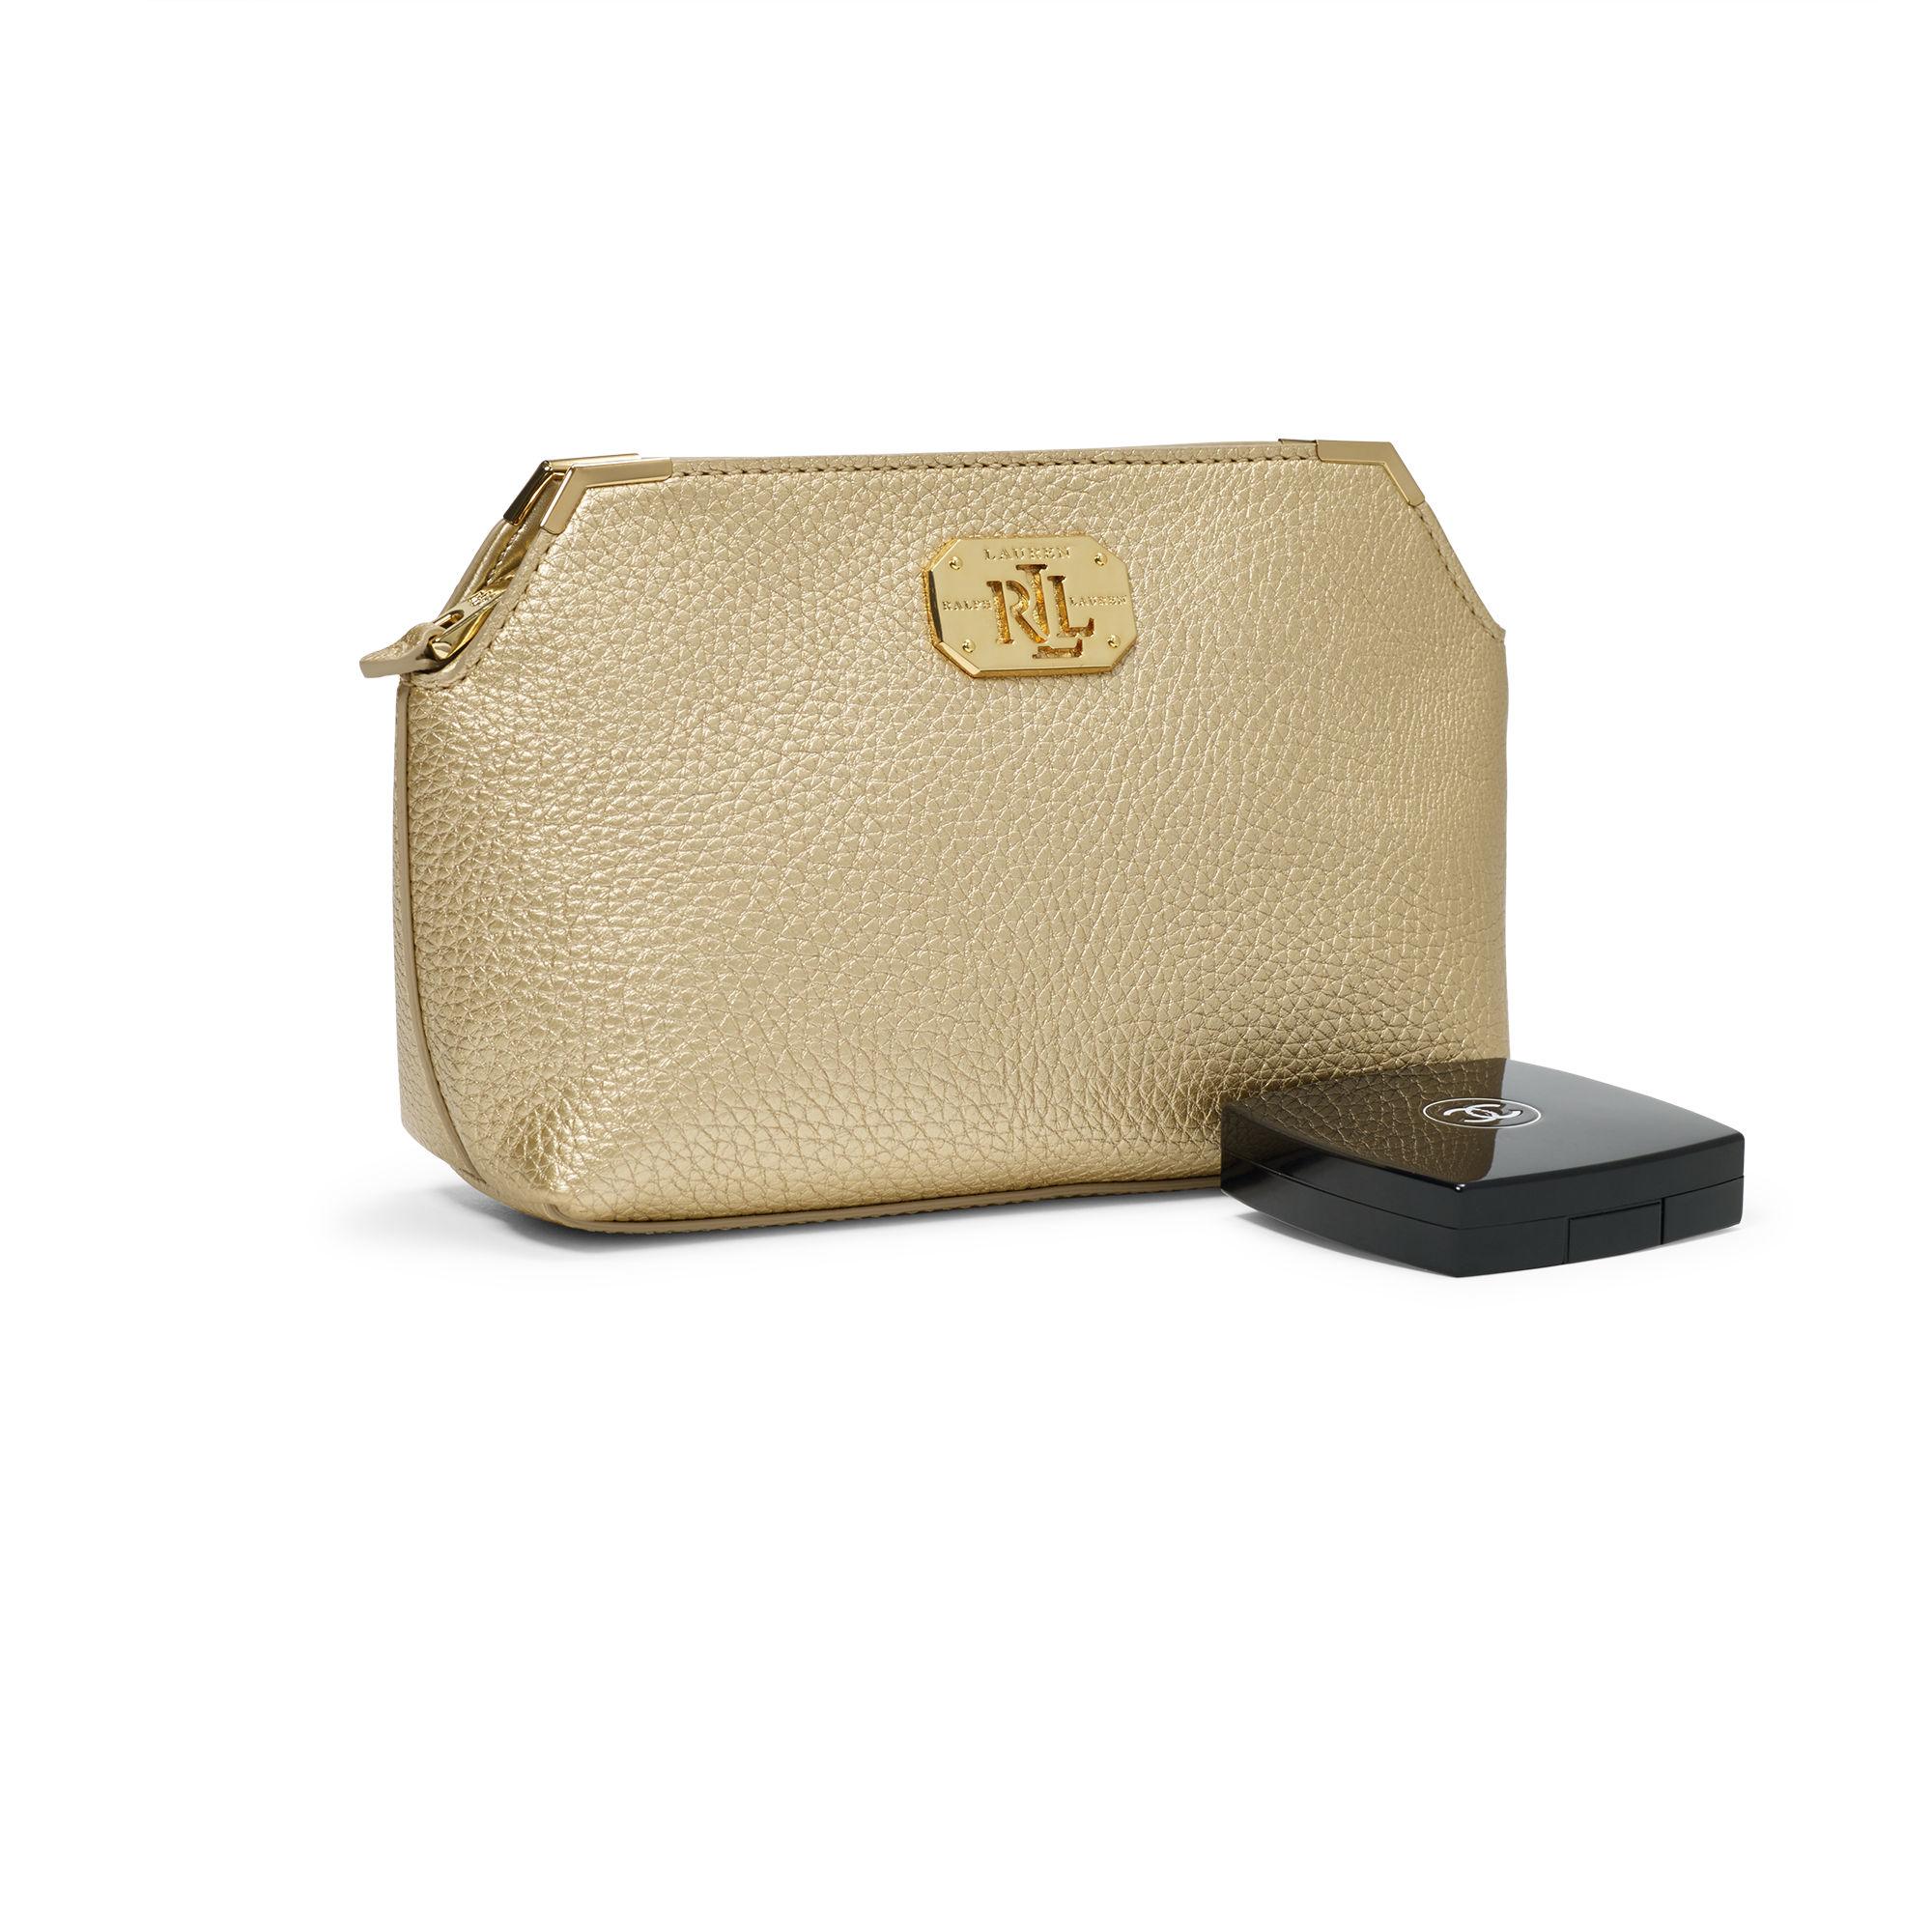 4399e0e14ea5 Ralph Lauren Acadia Cosmetic Bag in Metallic - Lyst